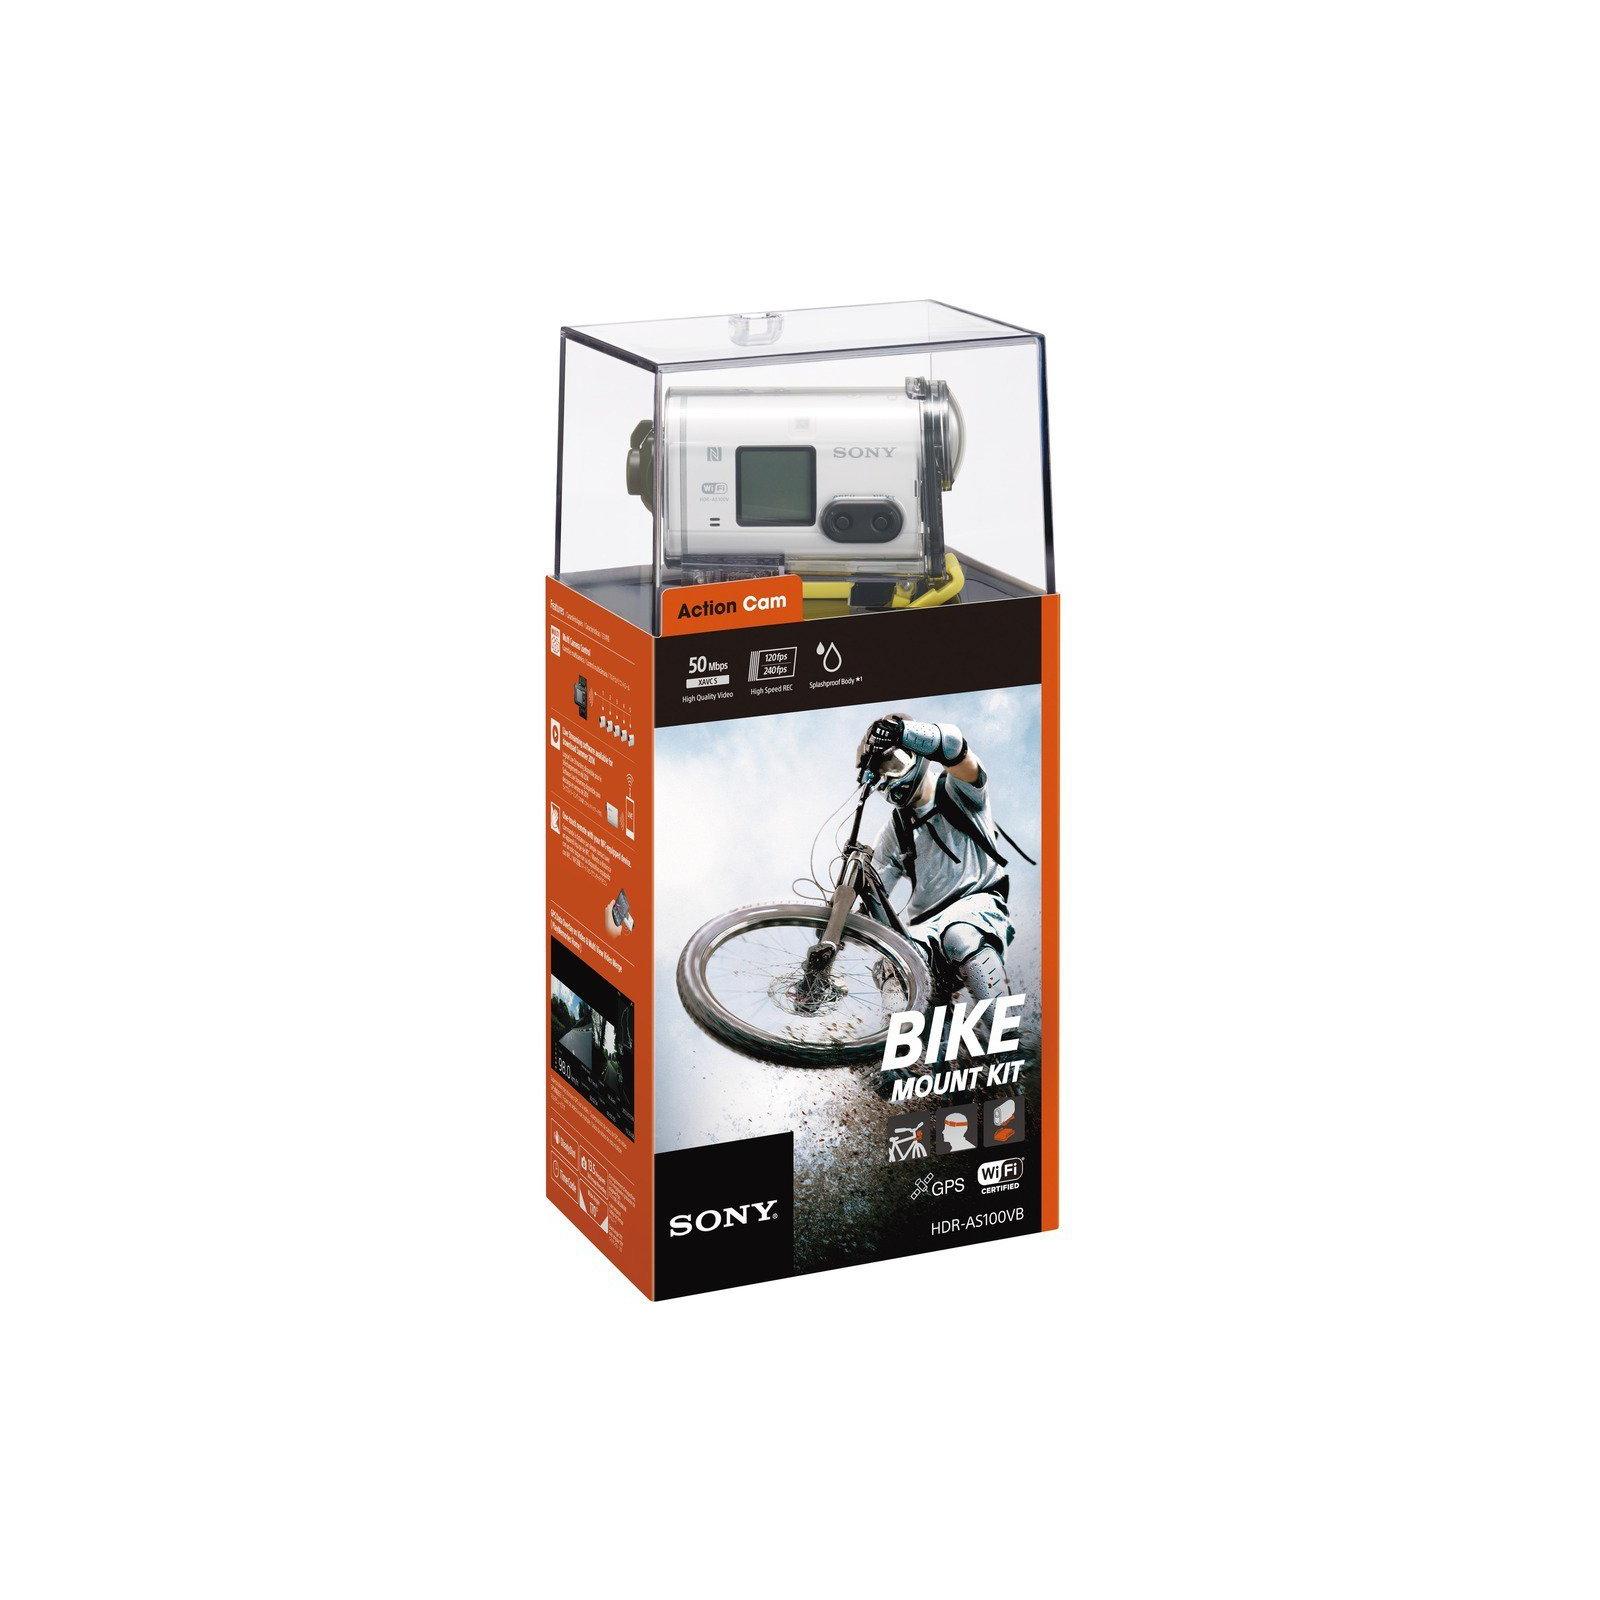 Экшн-камера SONY HDR-AS100V w/bicycle mount (HDRAS100VB.CEN) изображение 10